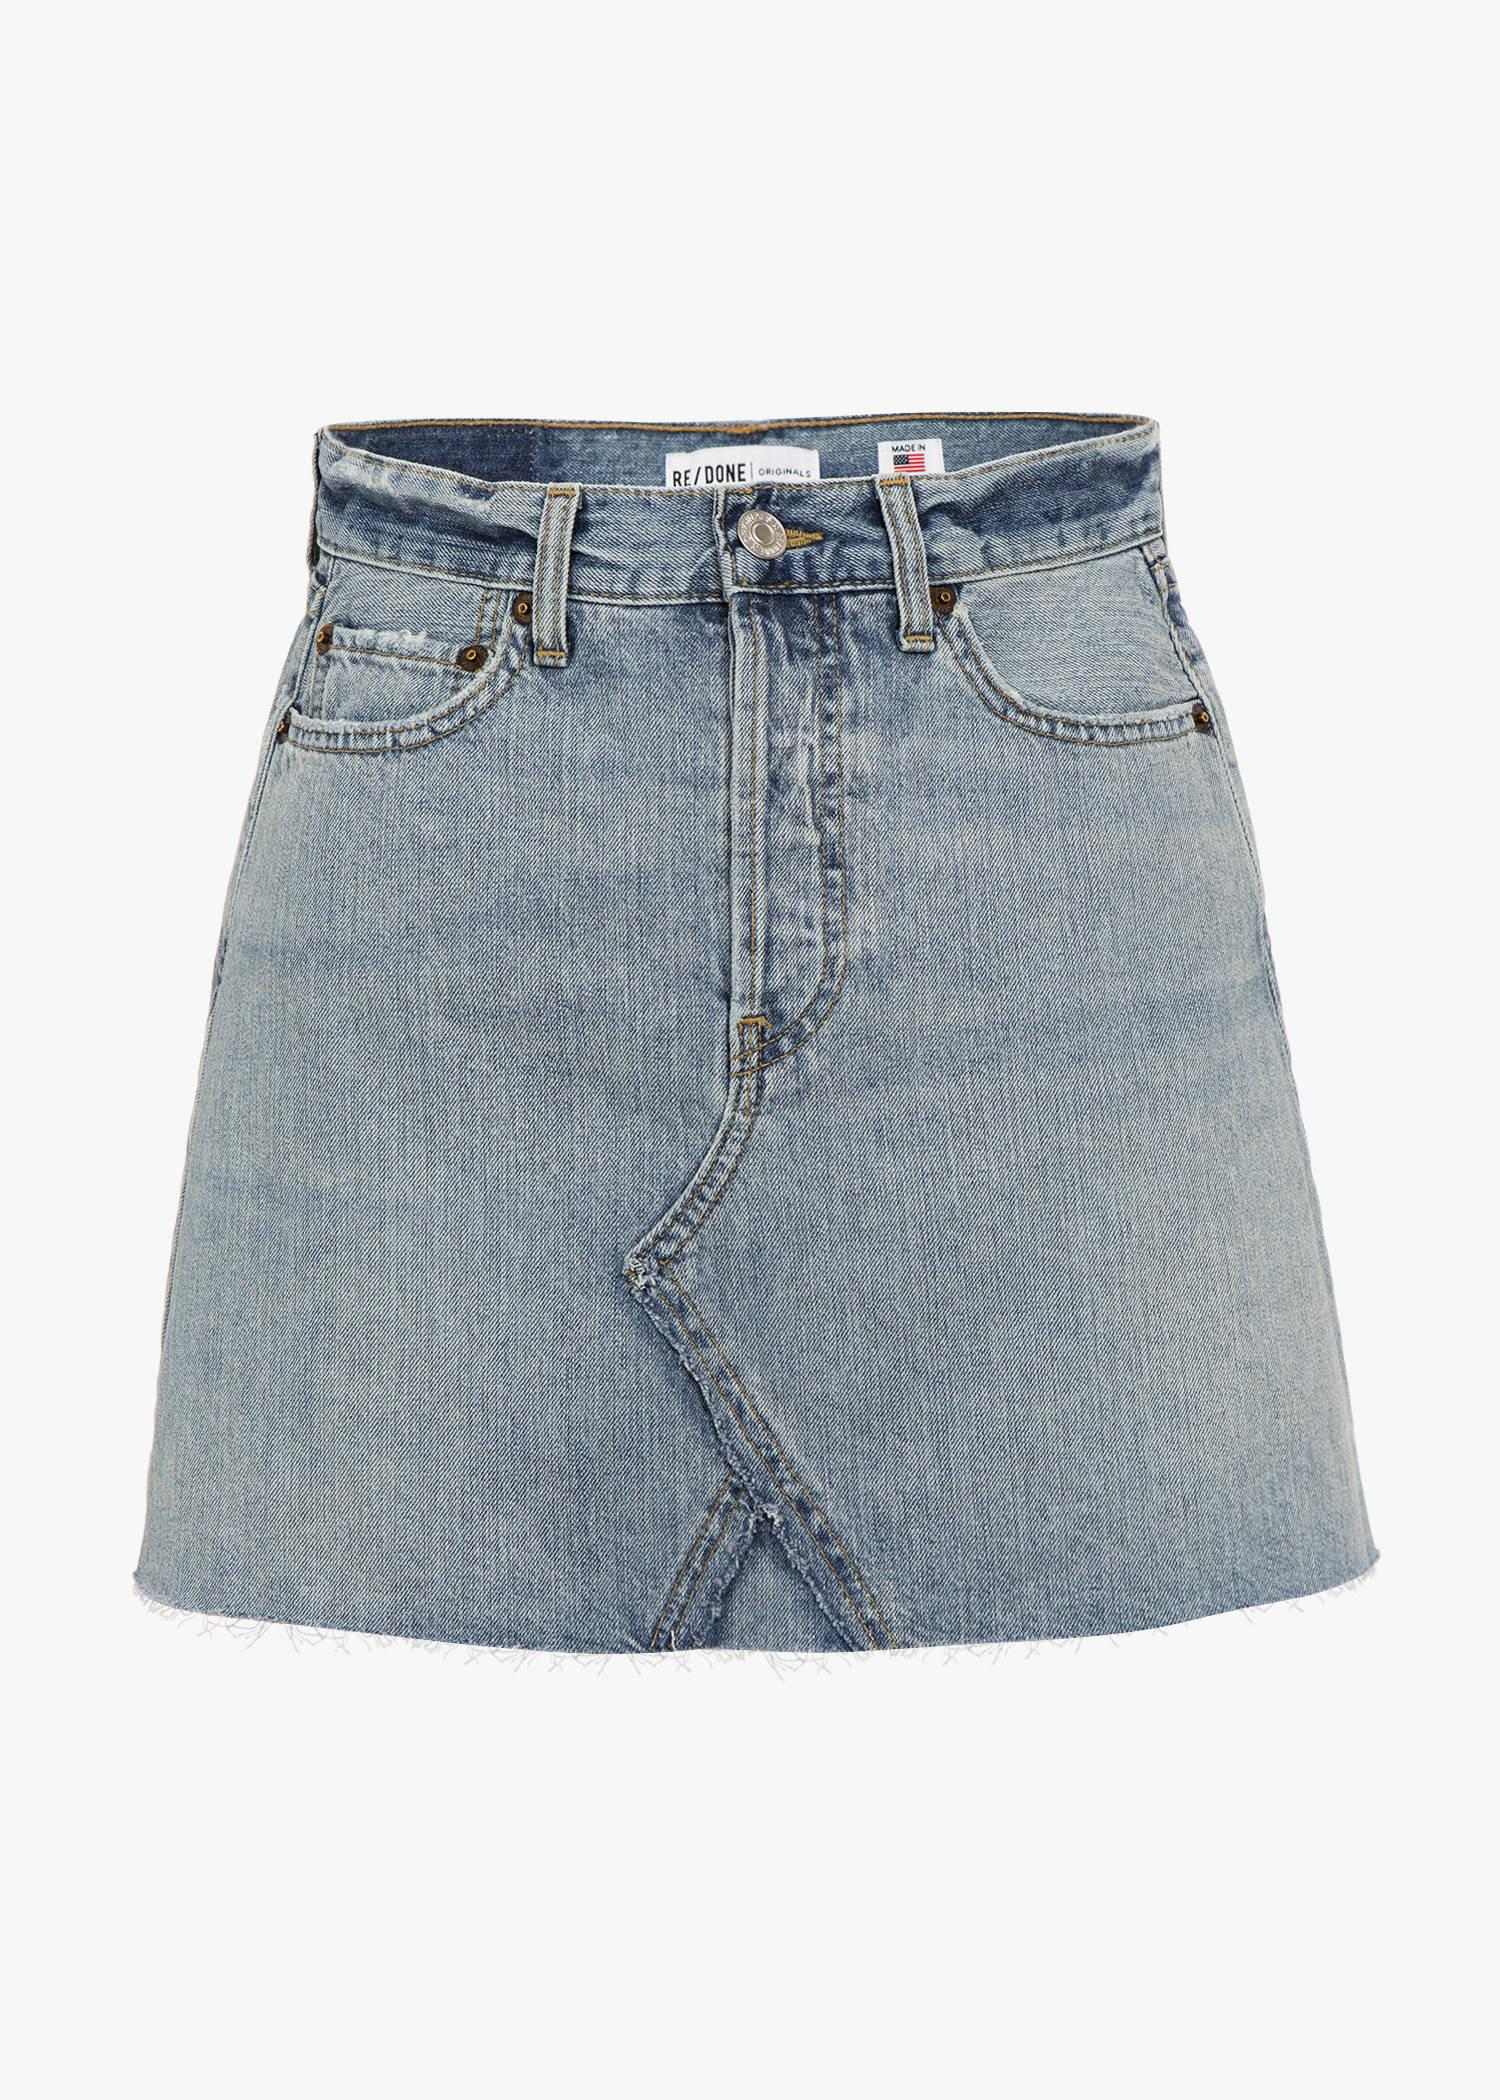 Re/done + Levi's Distressed Denim Mini Skirt In Ultra Light